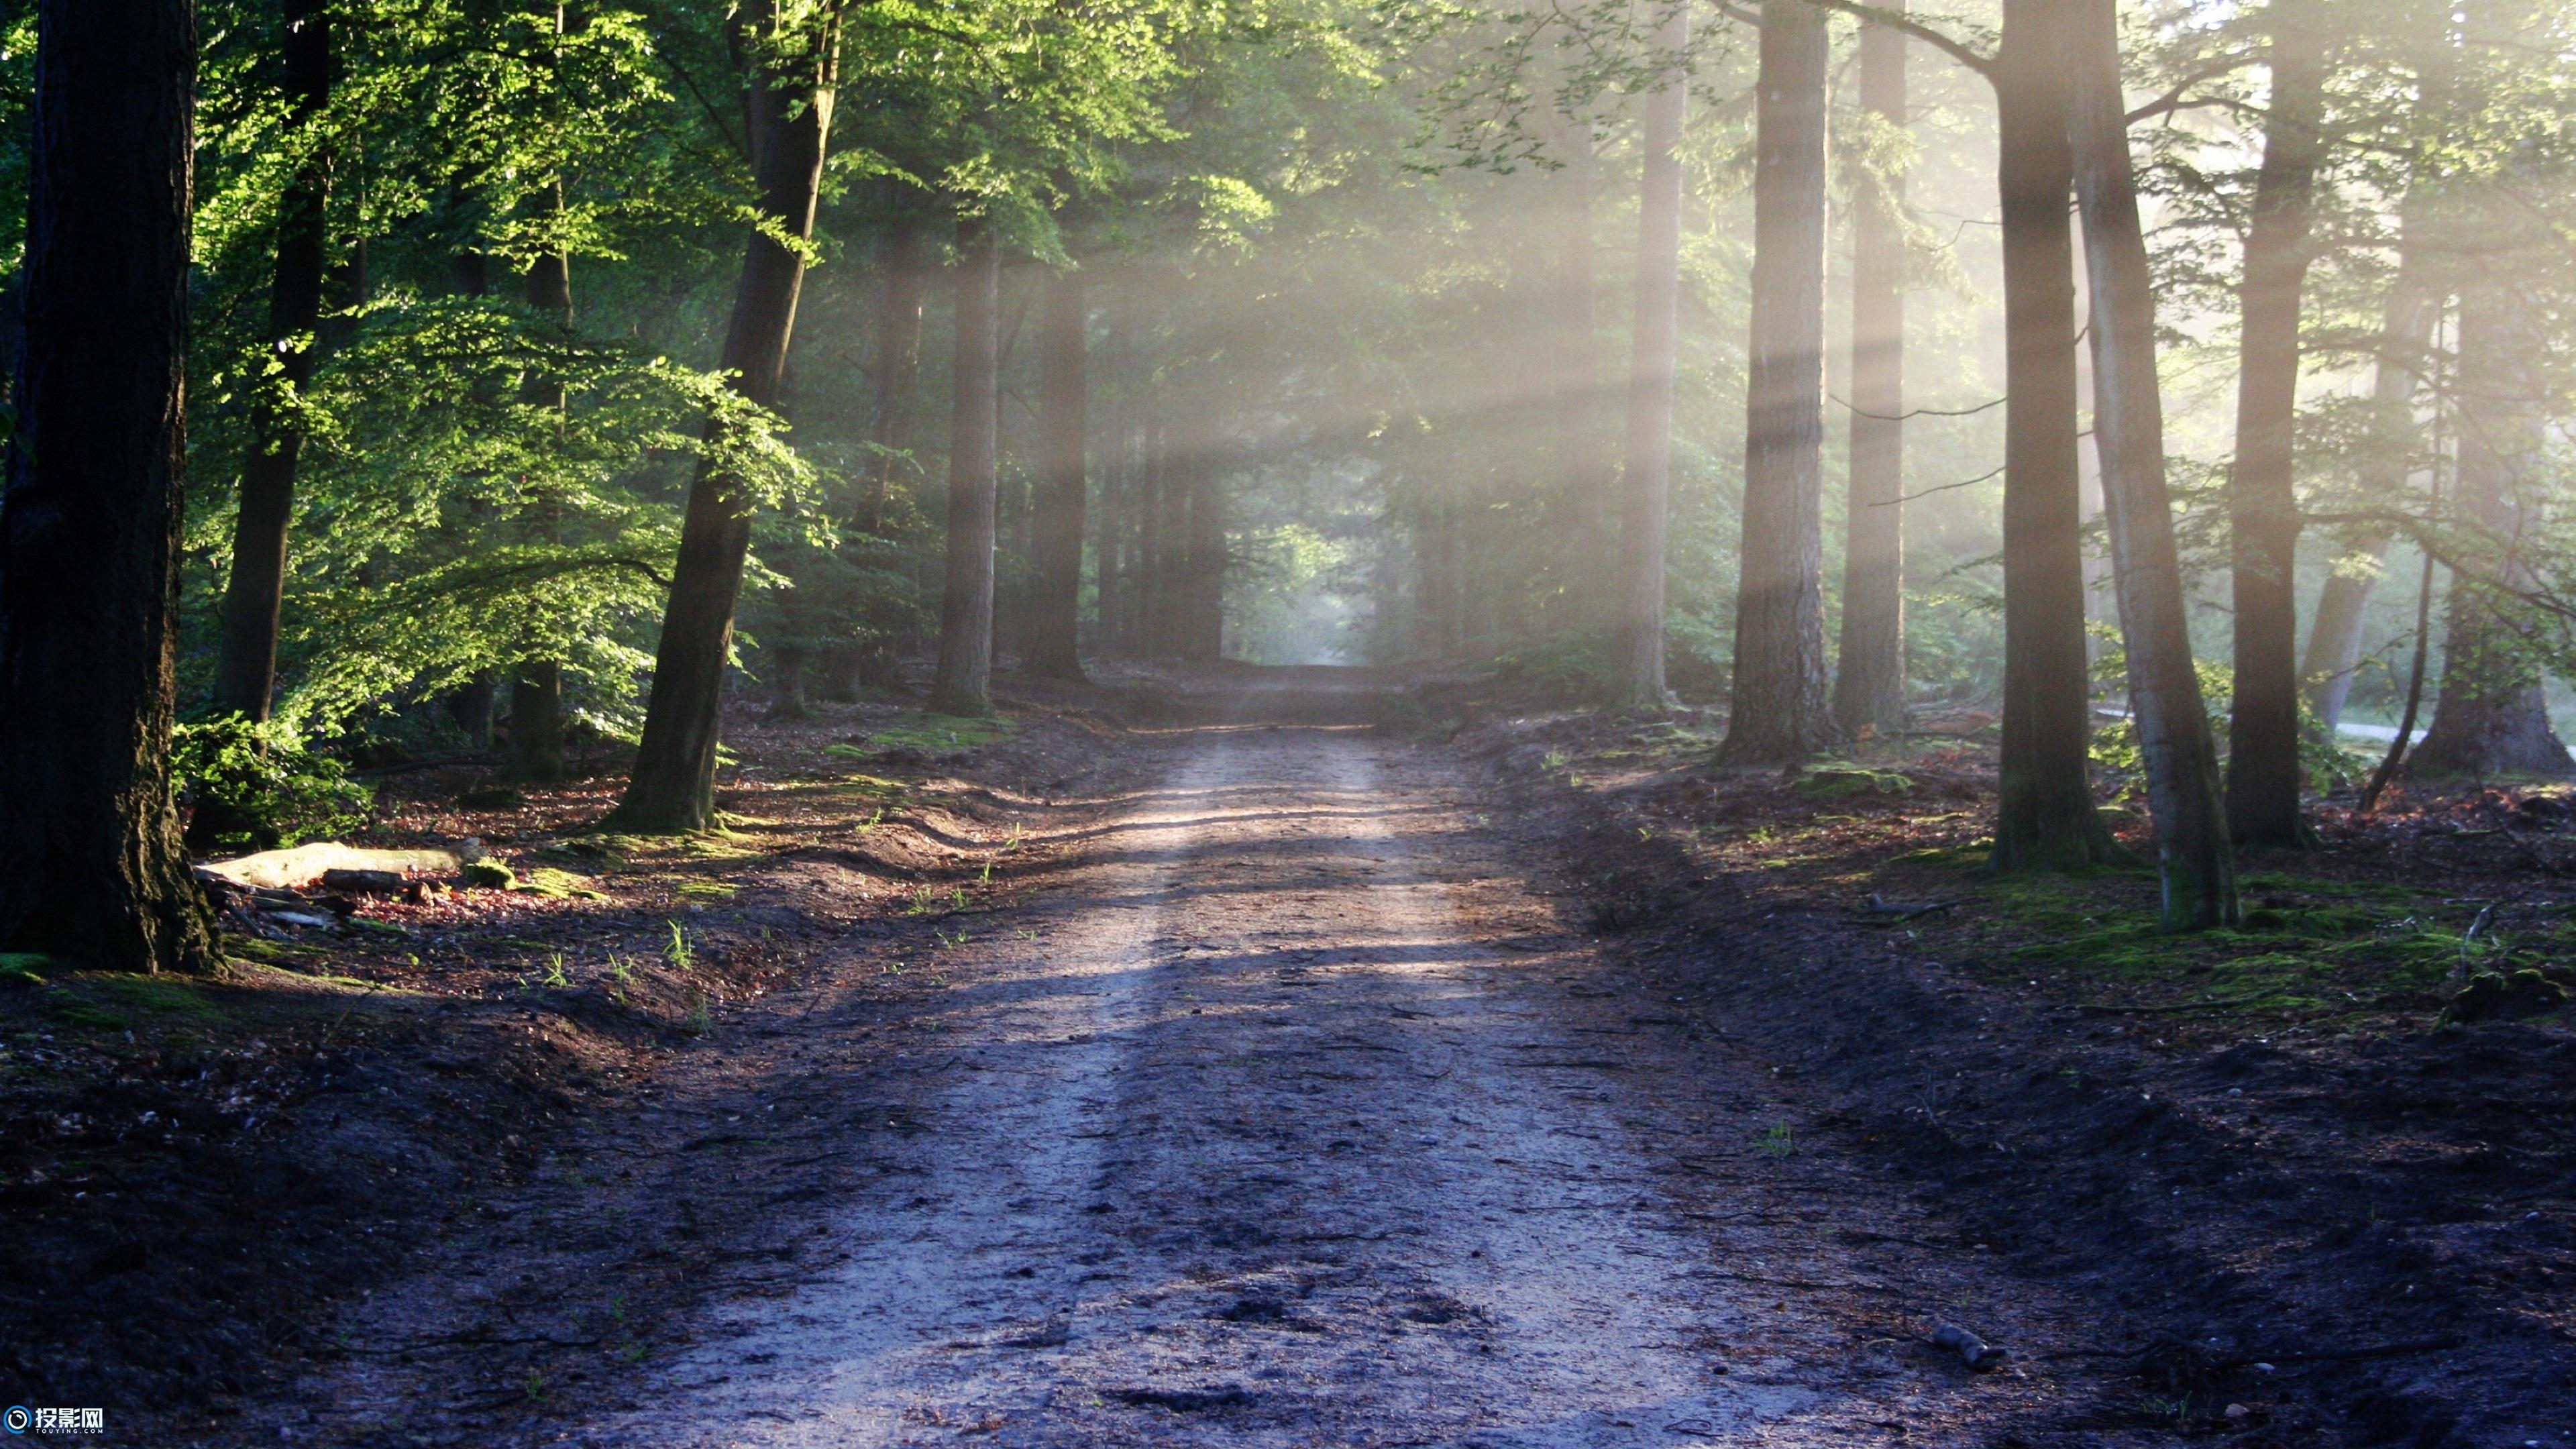 4K 森林风景图片11P [分辨率3840x2160x27.3MB]